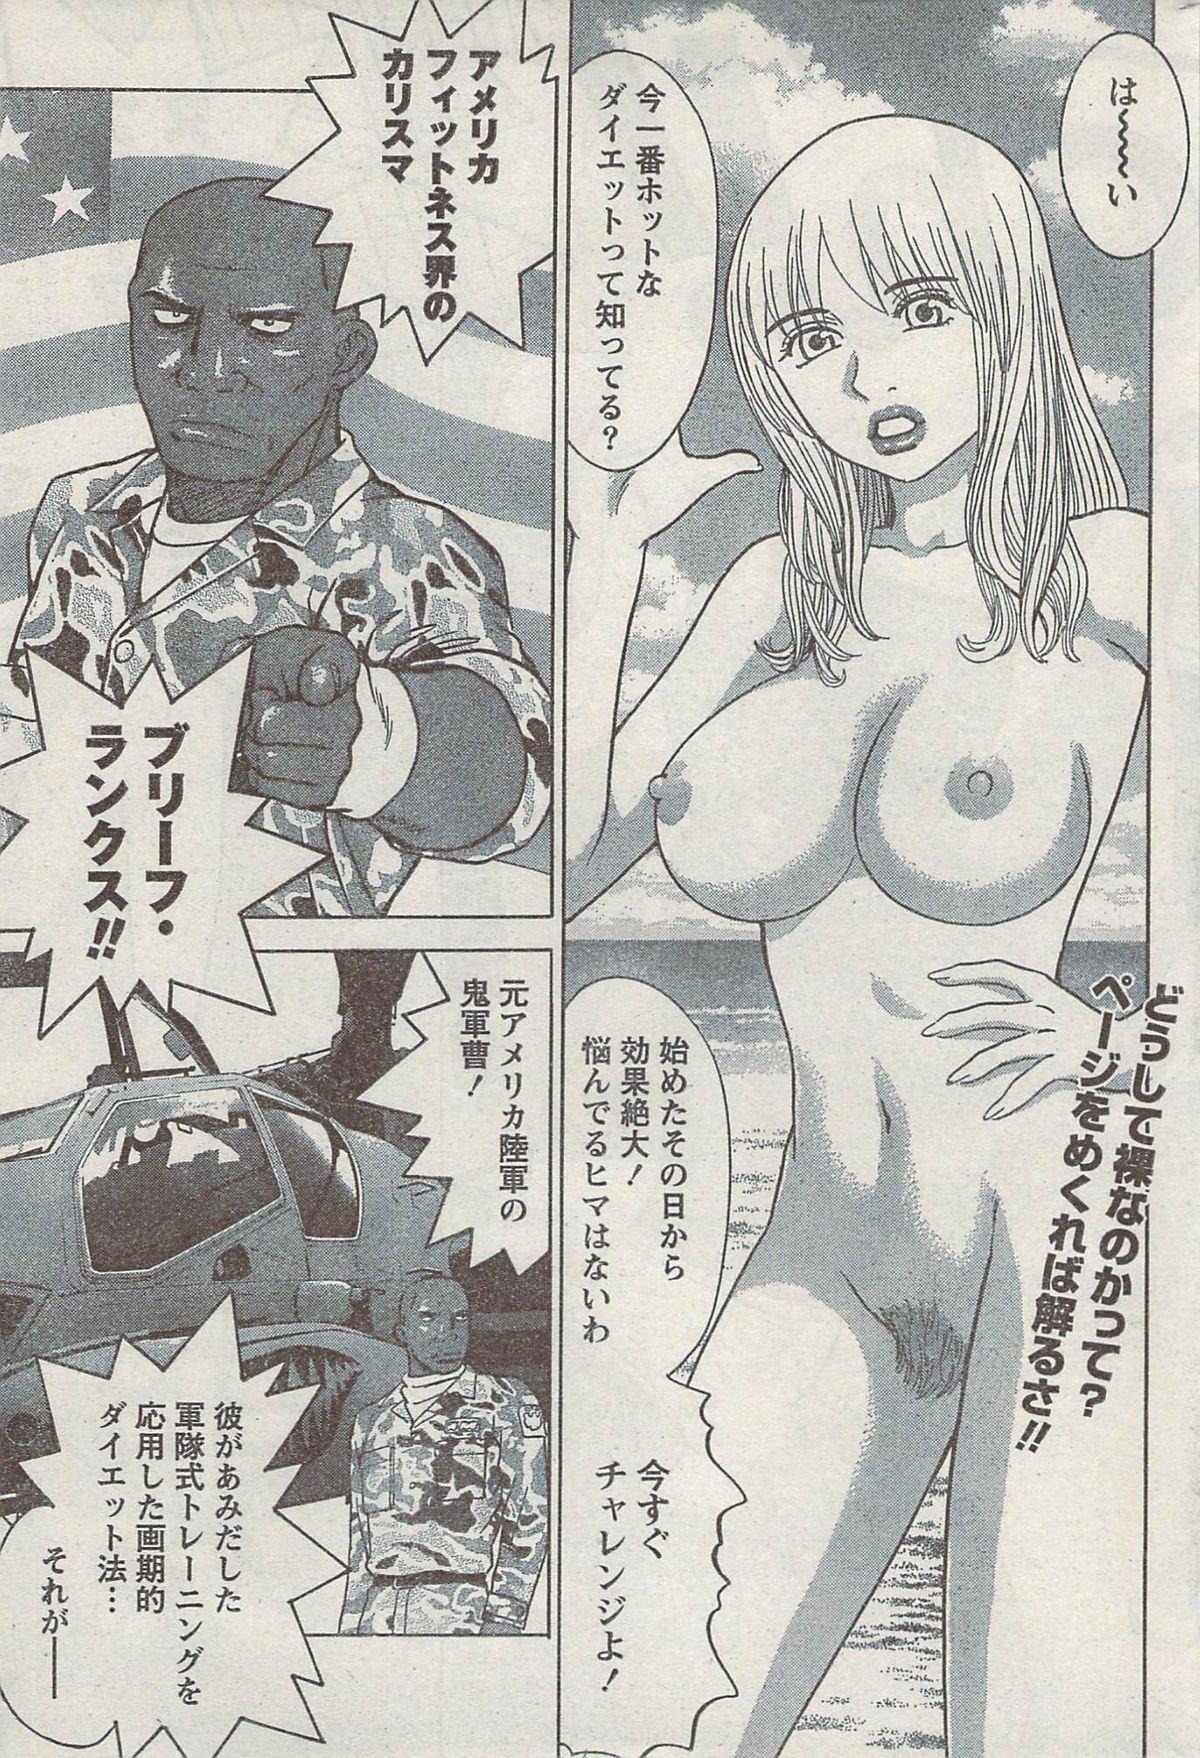 Monthly Vitaman 2007-08 230